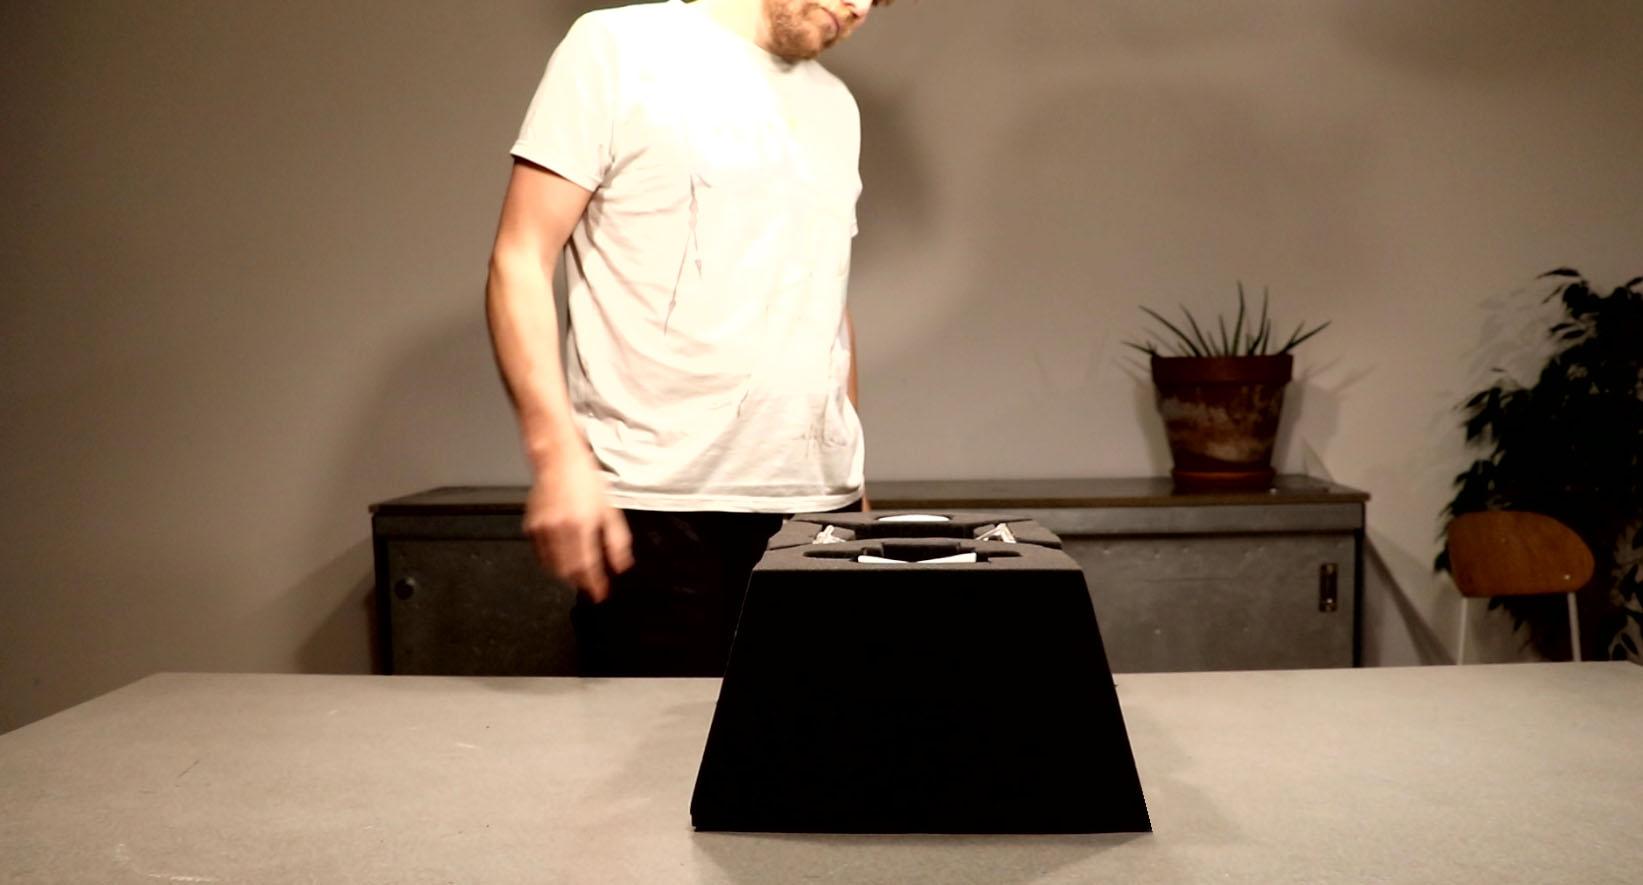 DIY Drone Case DJI